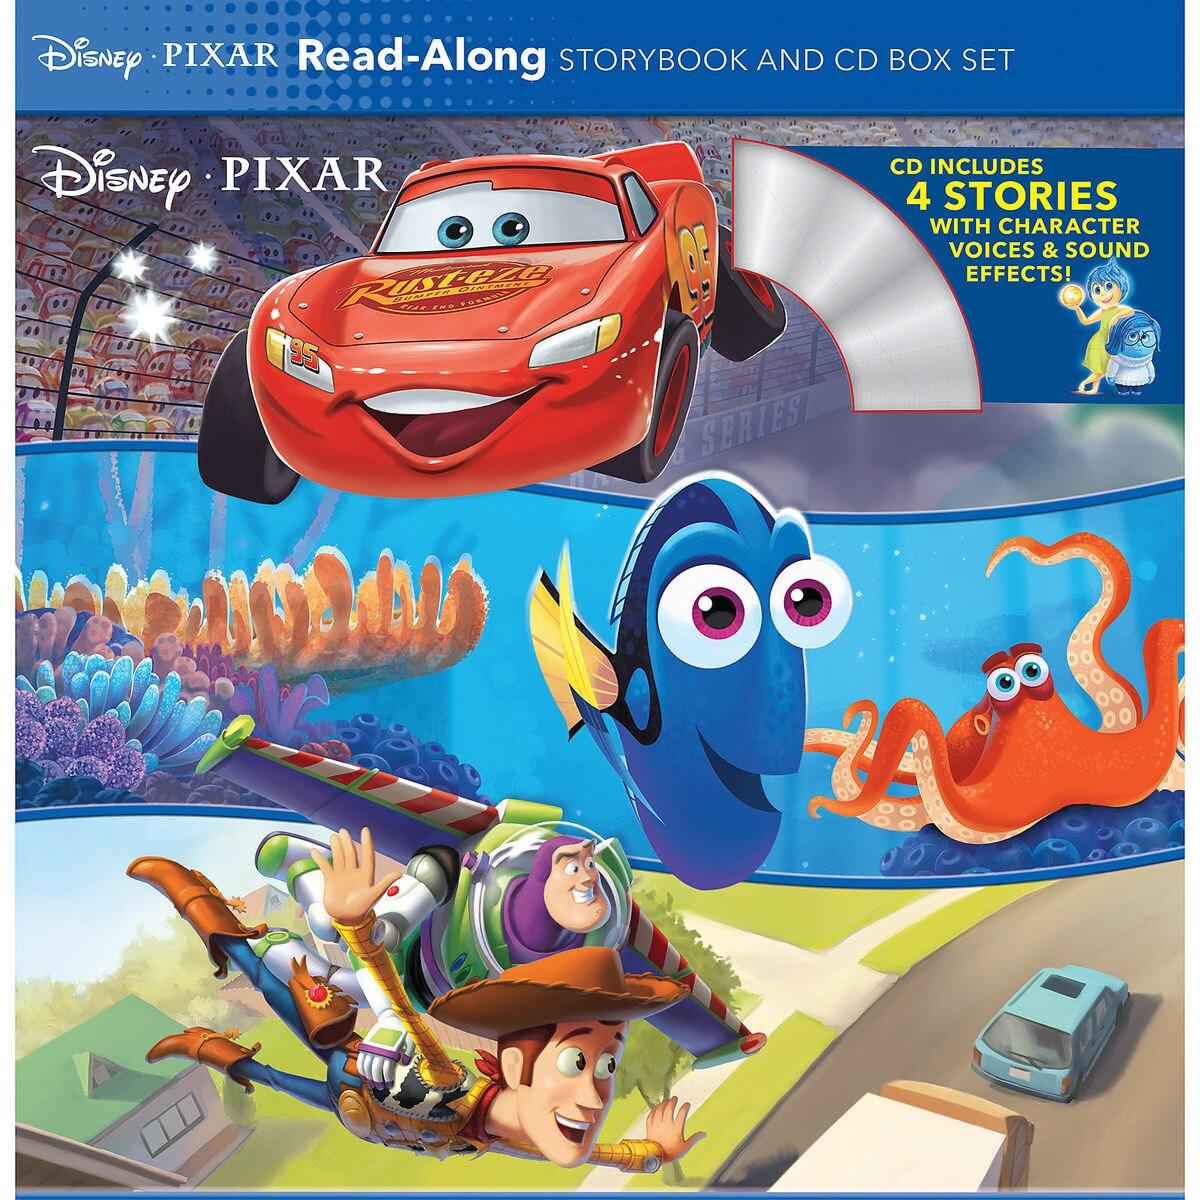 disney pixar read along storybook and cd box set shopdisney